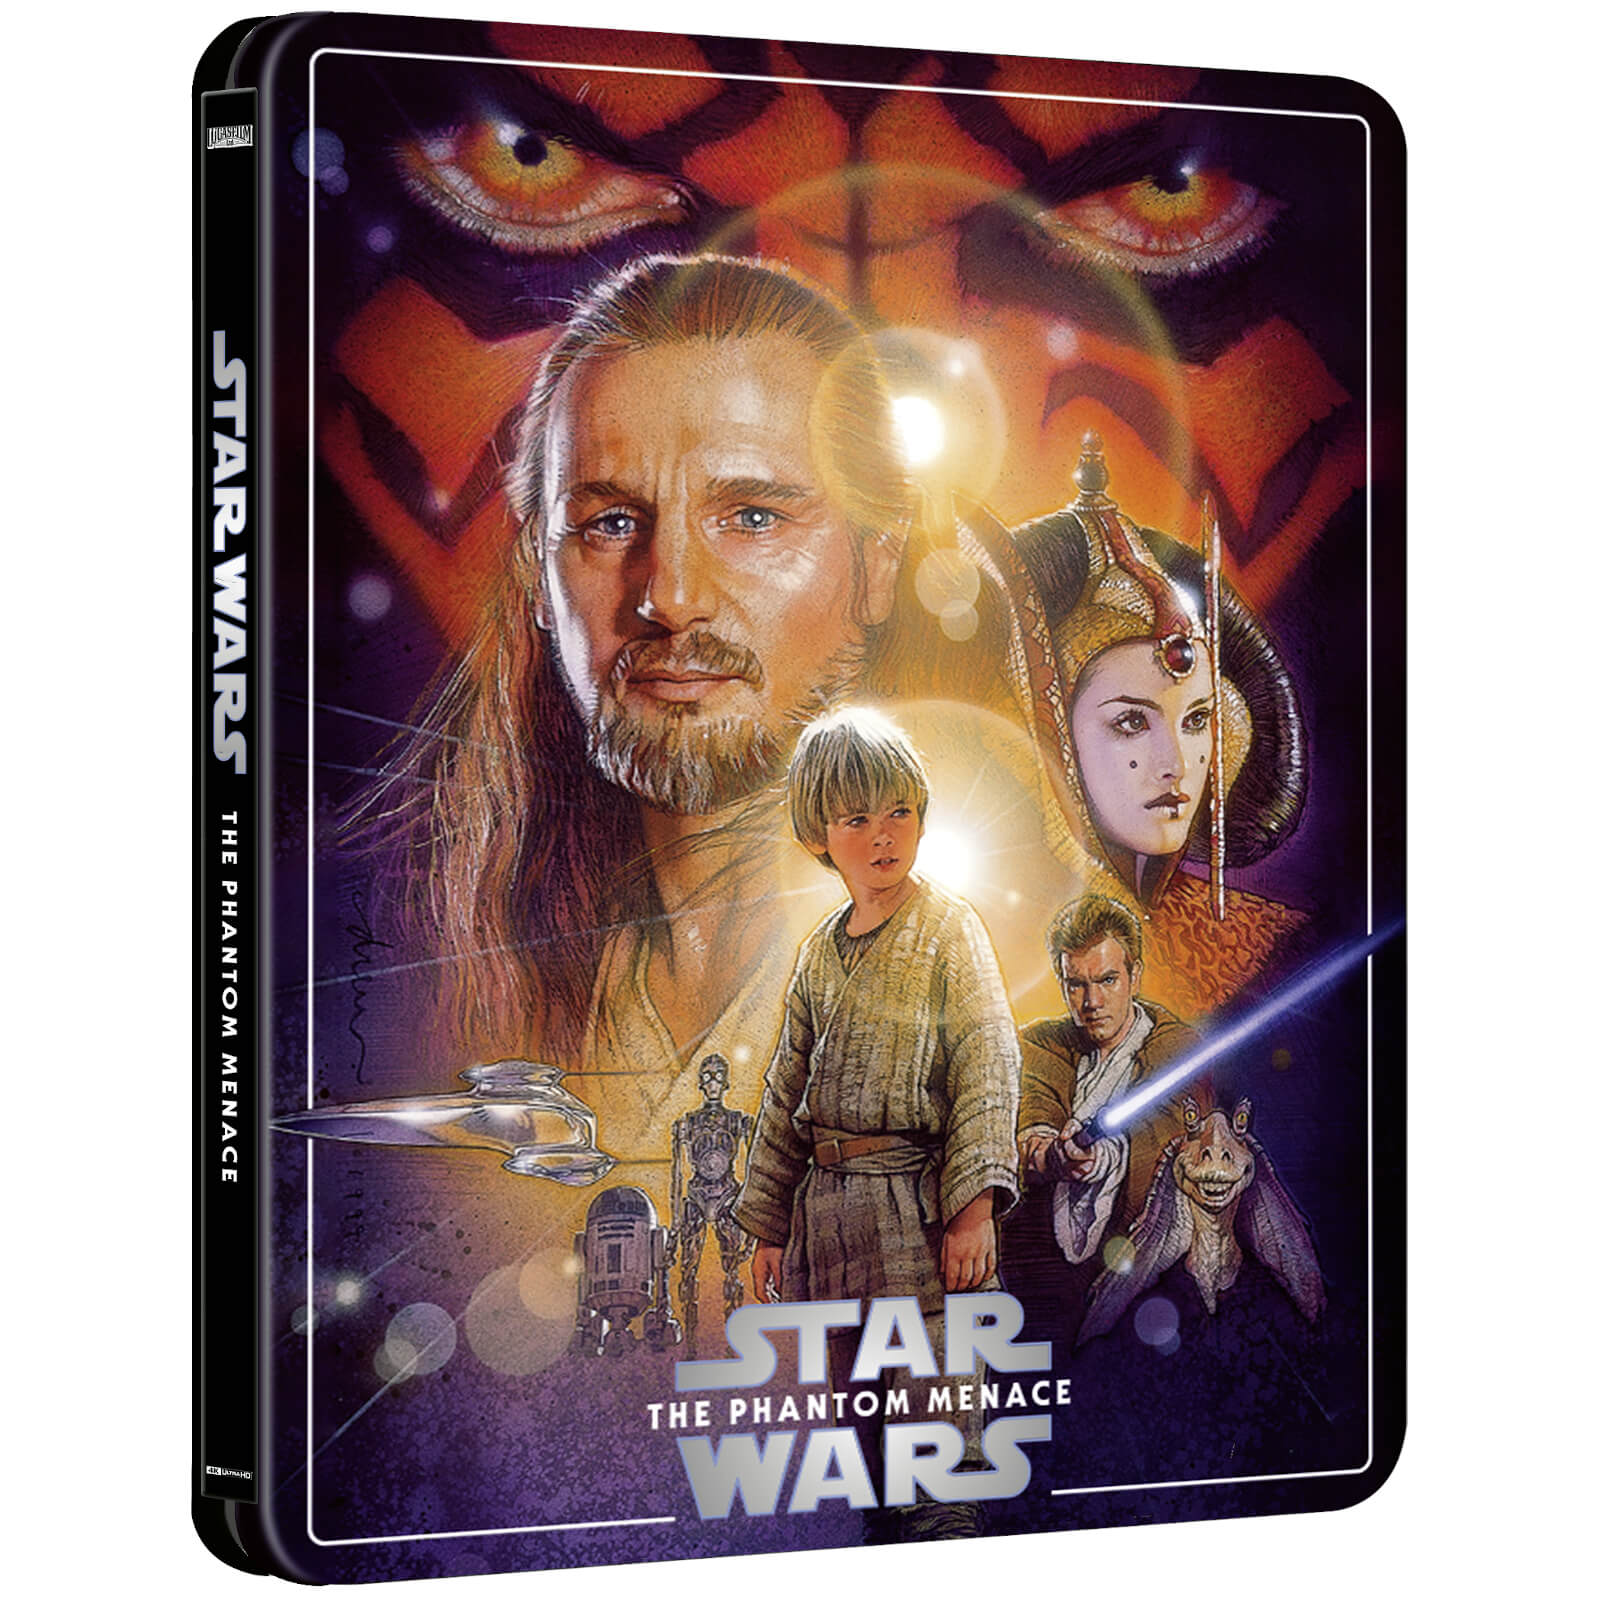 Star Wars: Episode I - The Phantom Menace (4K+2D Blu-ray SteelBook) Zavvi Star-Wars-The-Phantom-Menace-steelbook-4K-1